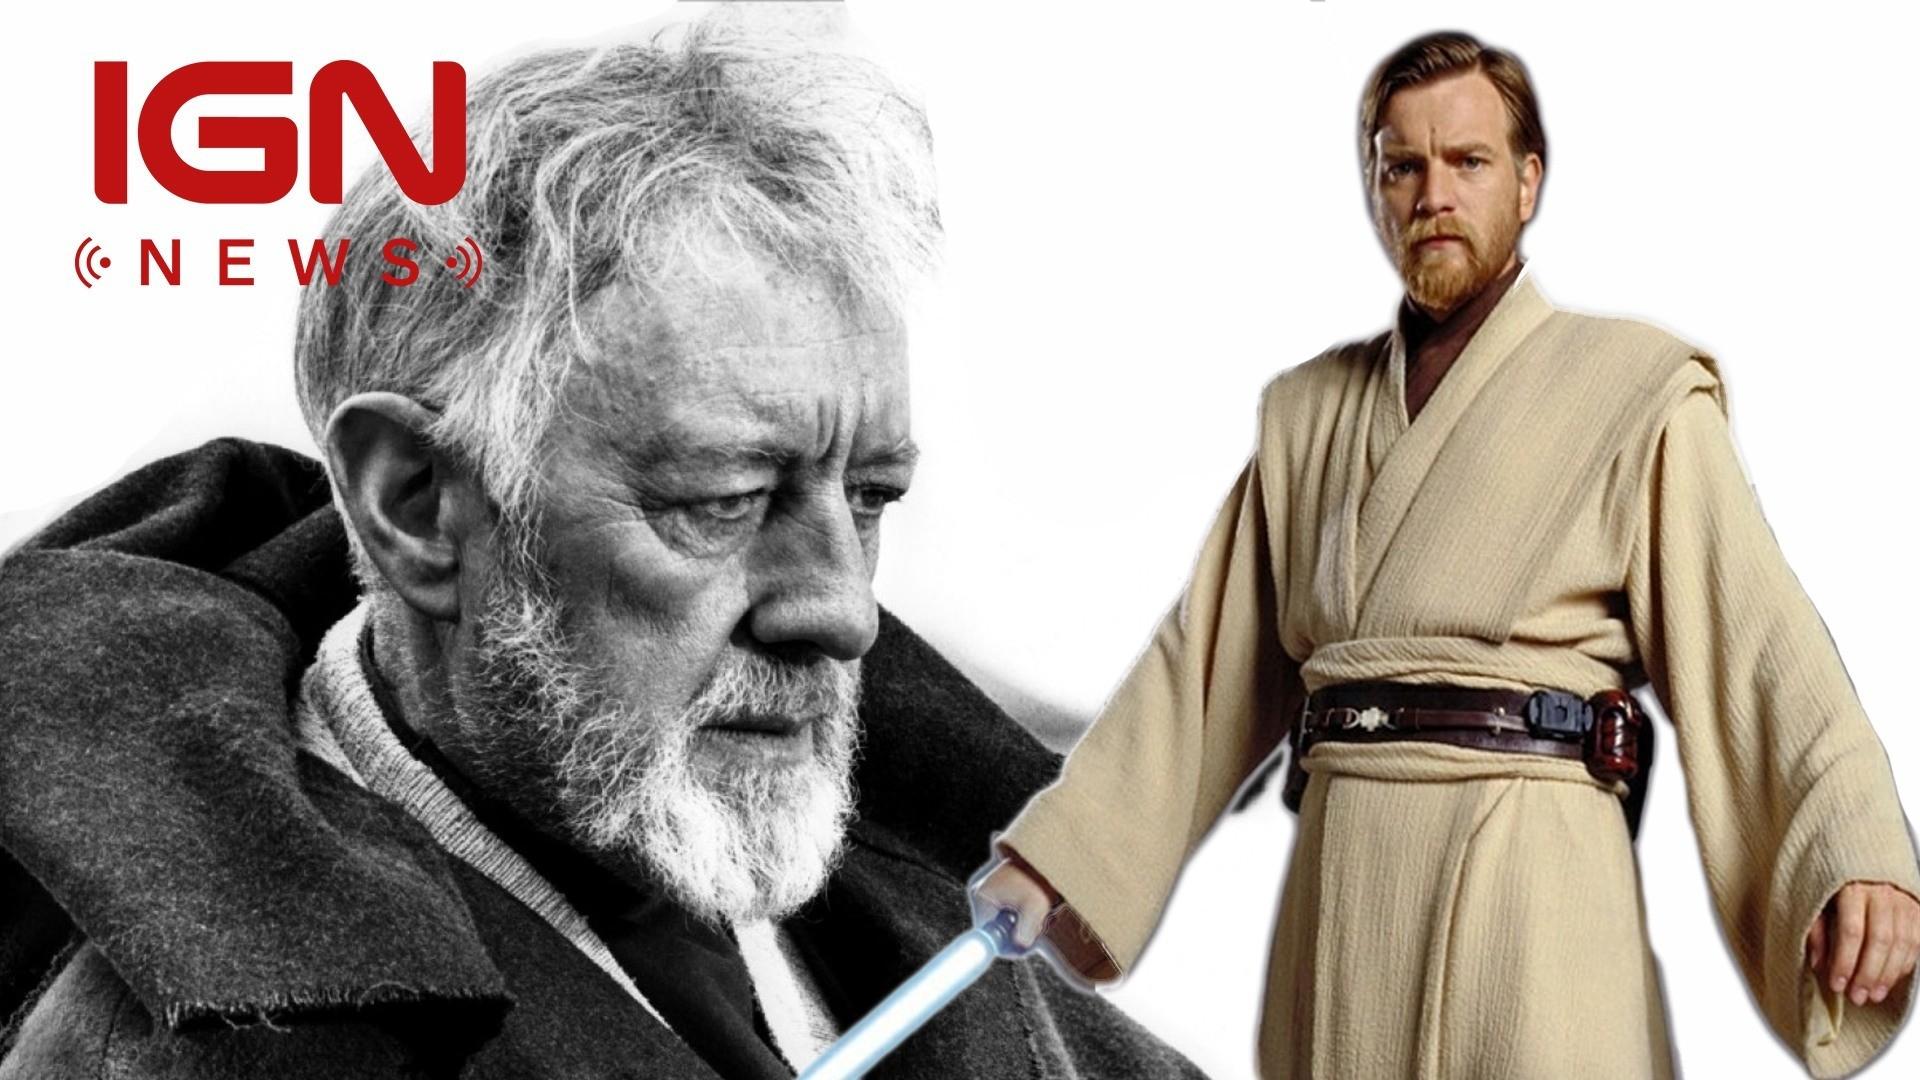 Star Wars: Obi-Wan Kenobi Standalone Film Reportedly in the Works –  star-wars-anthology-obi-wan